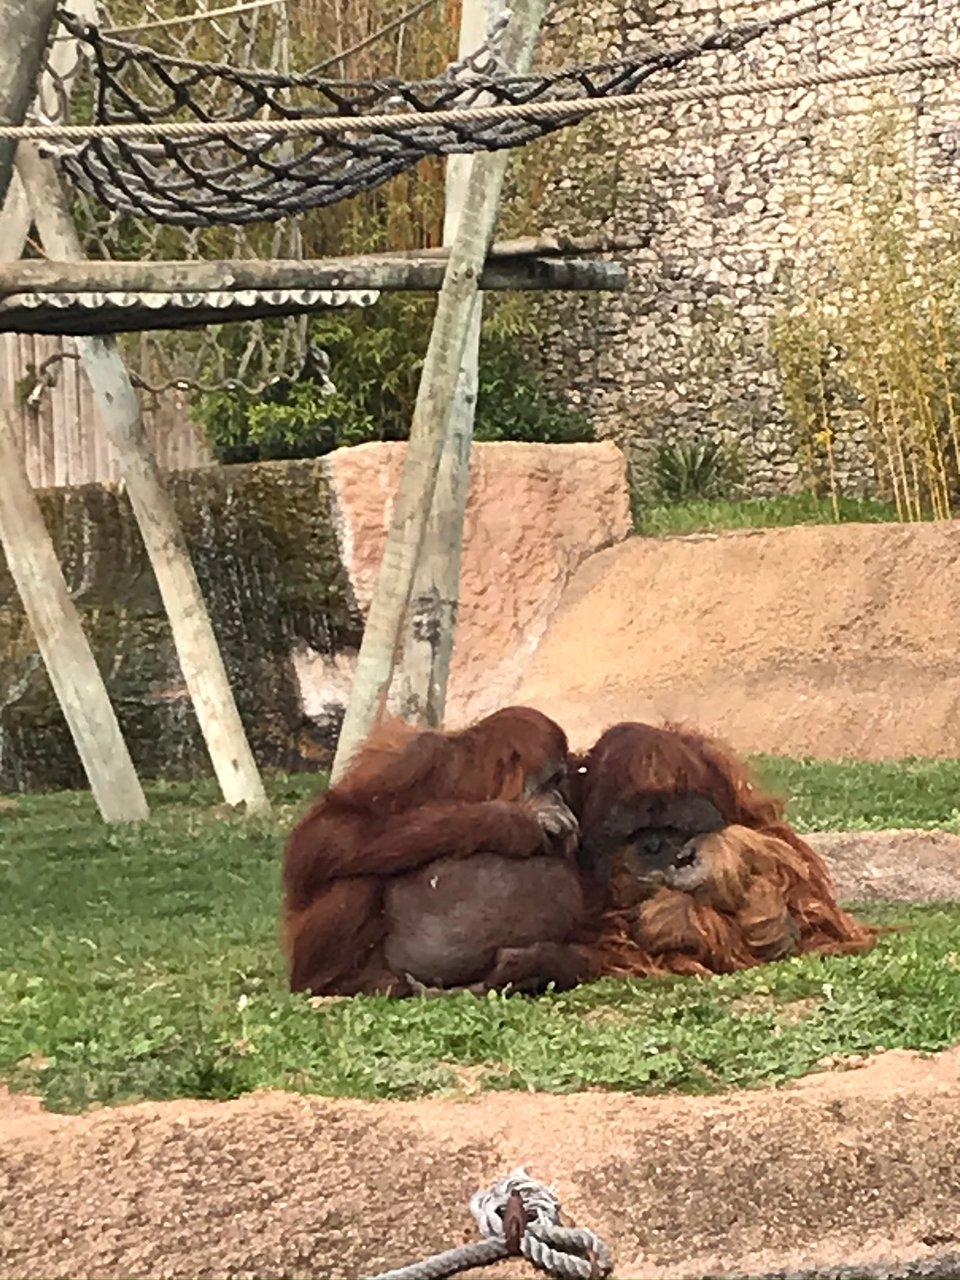 lisbon zoo pregnant orangutan